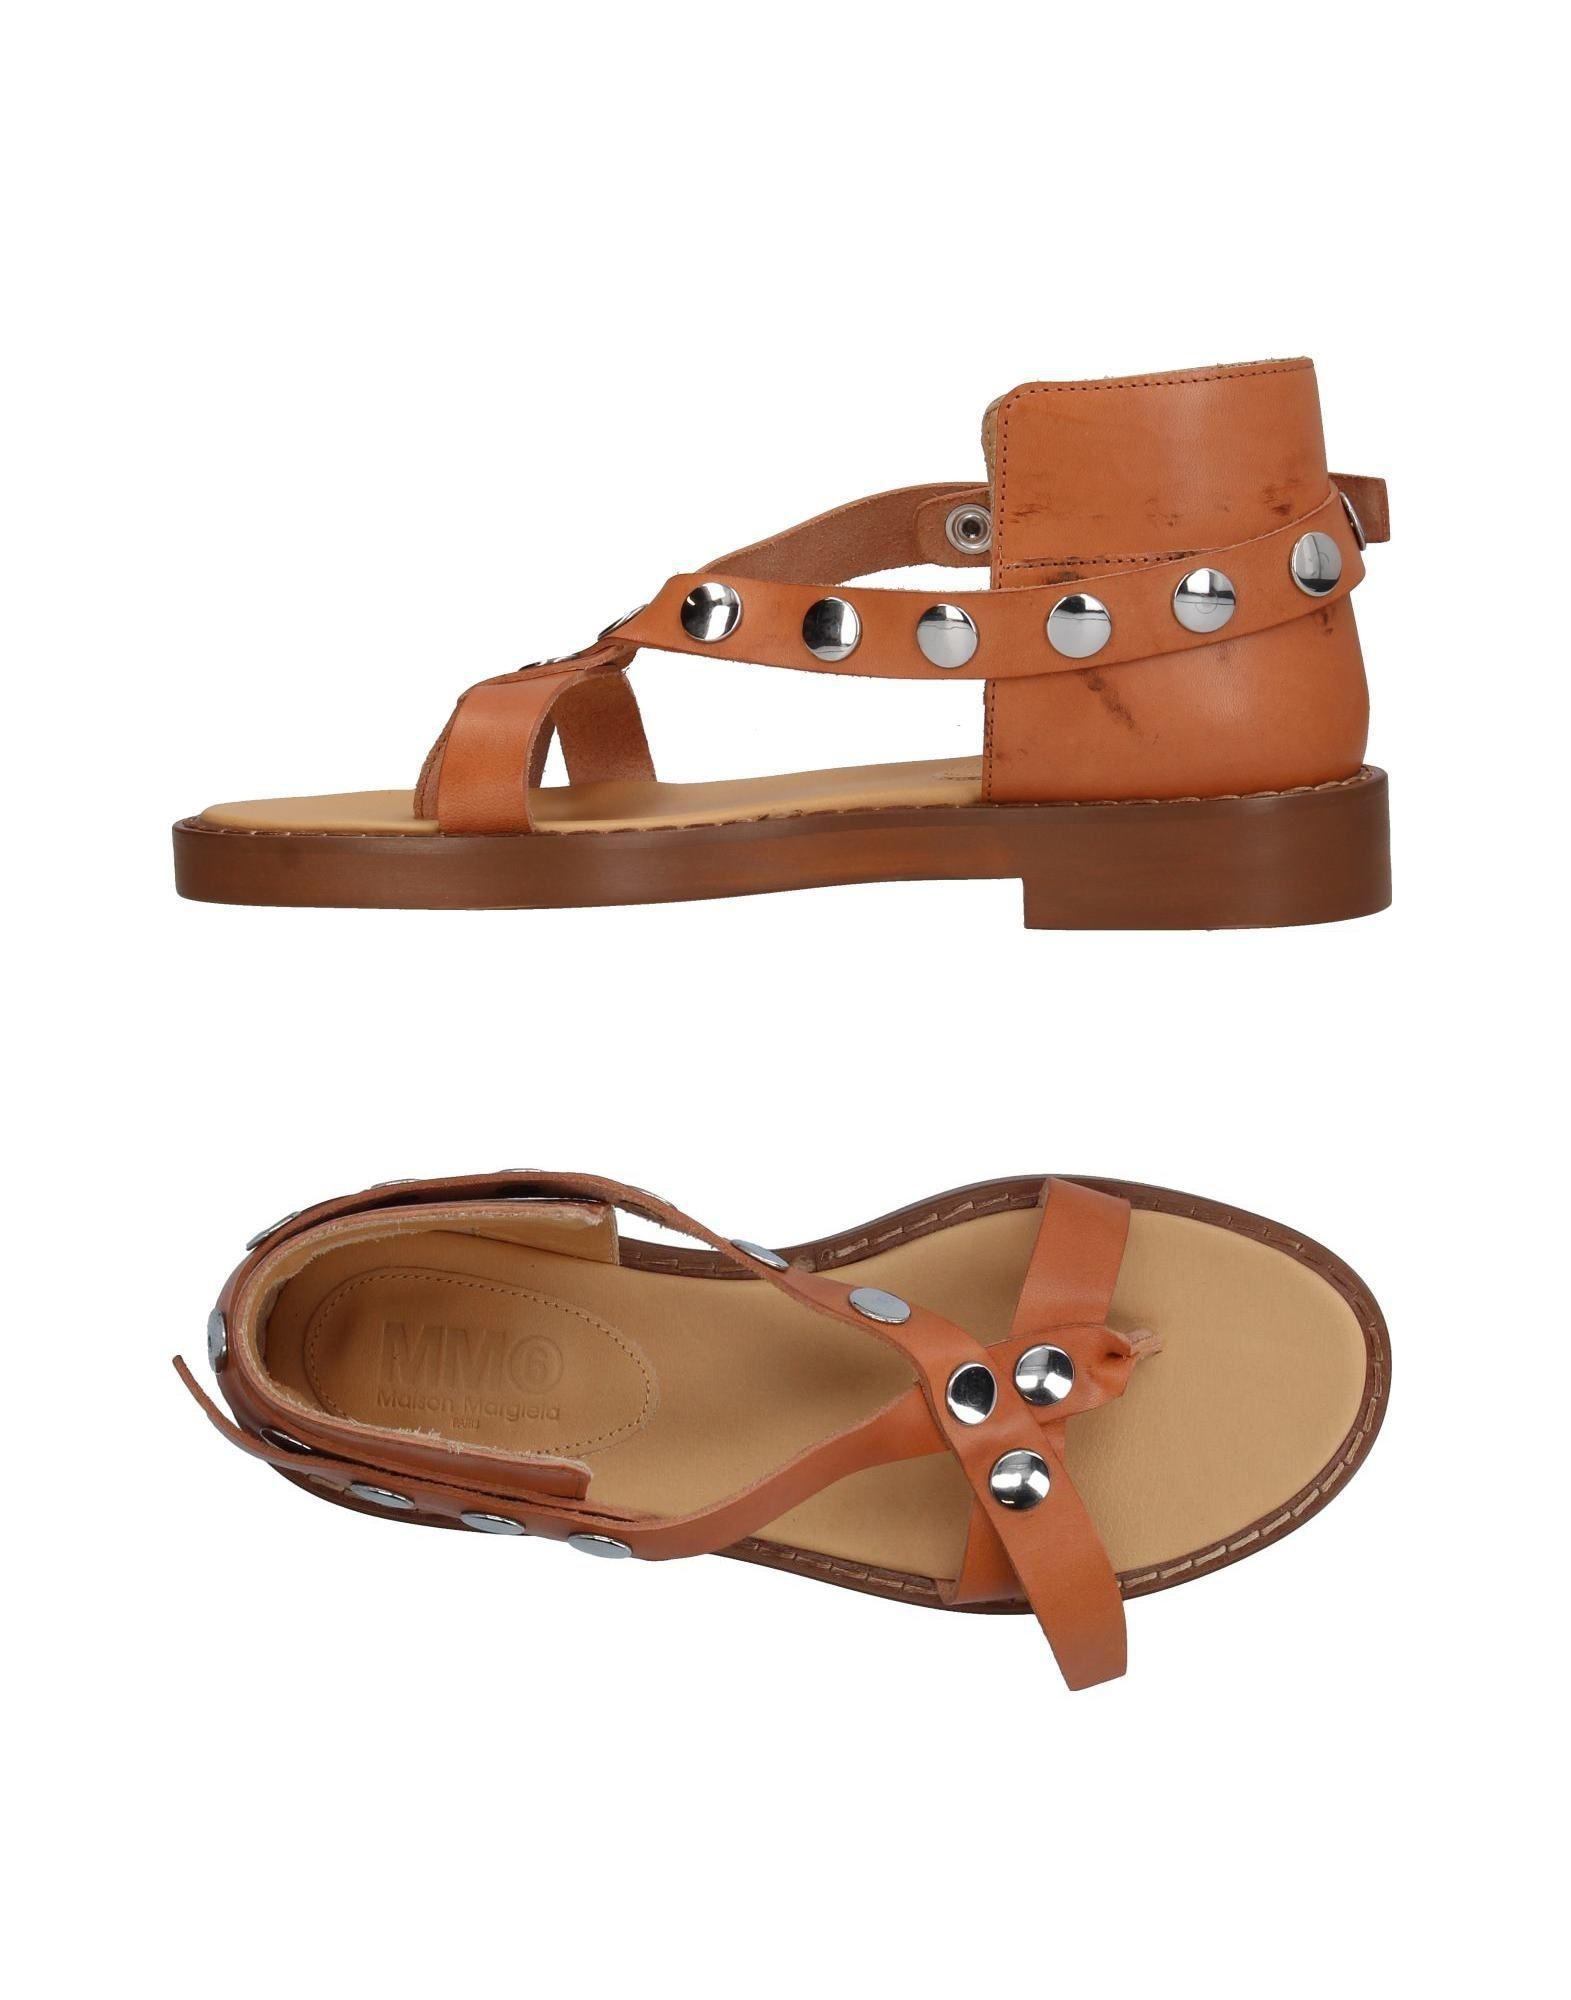 FOOTWEAR - Toe post sandals Maison Martin Margiela STKS1y2tZ0